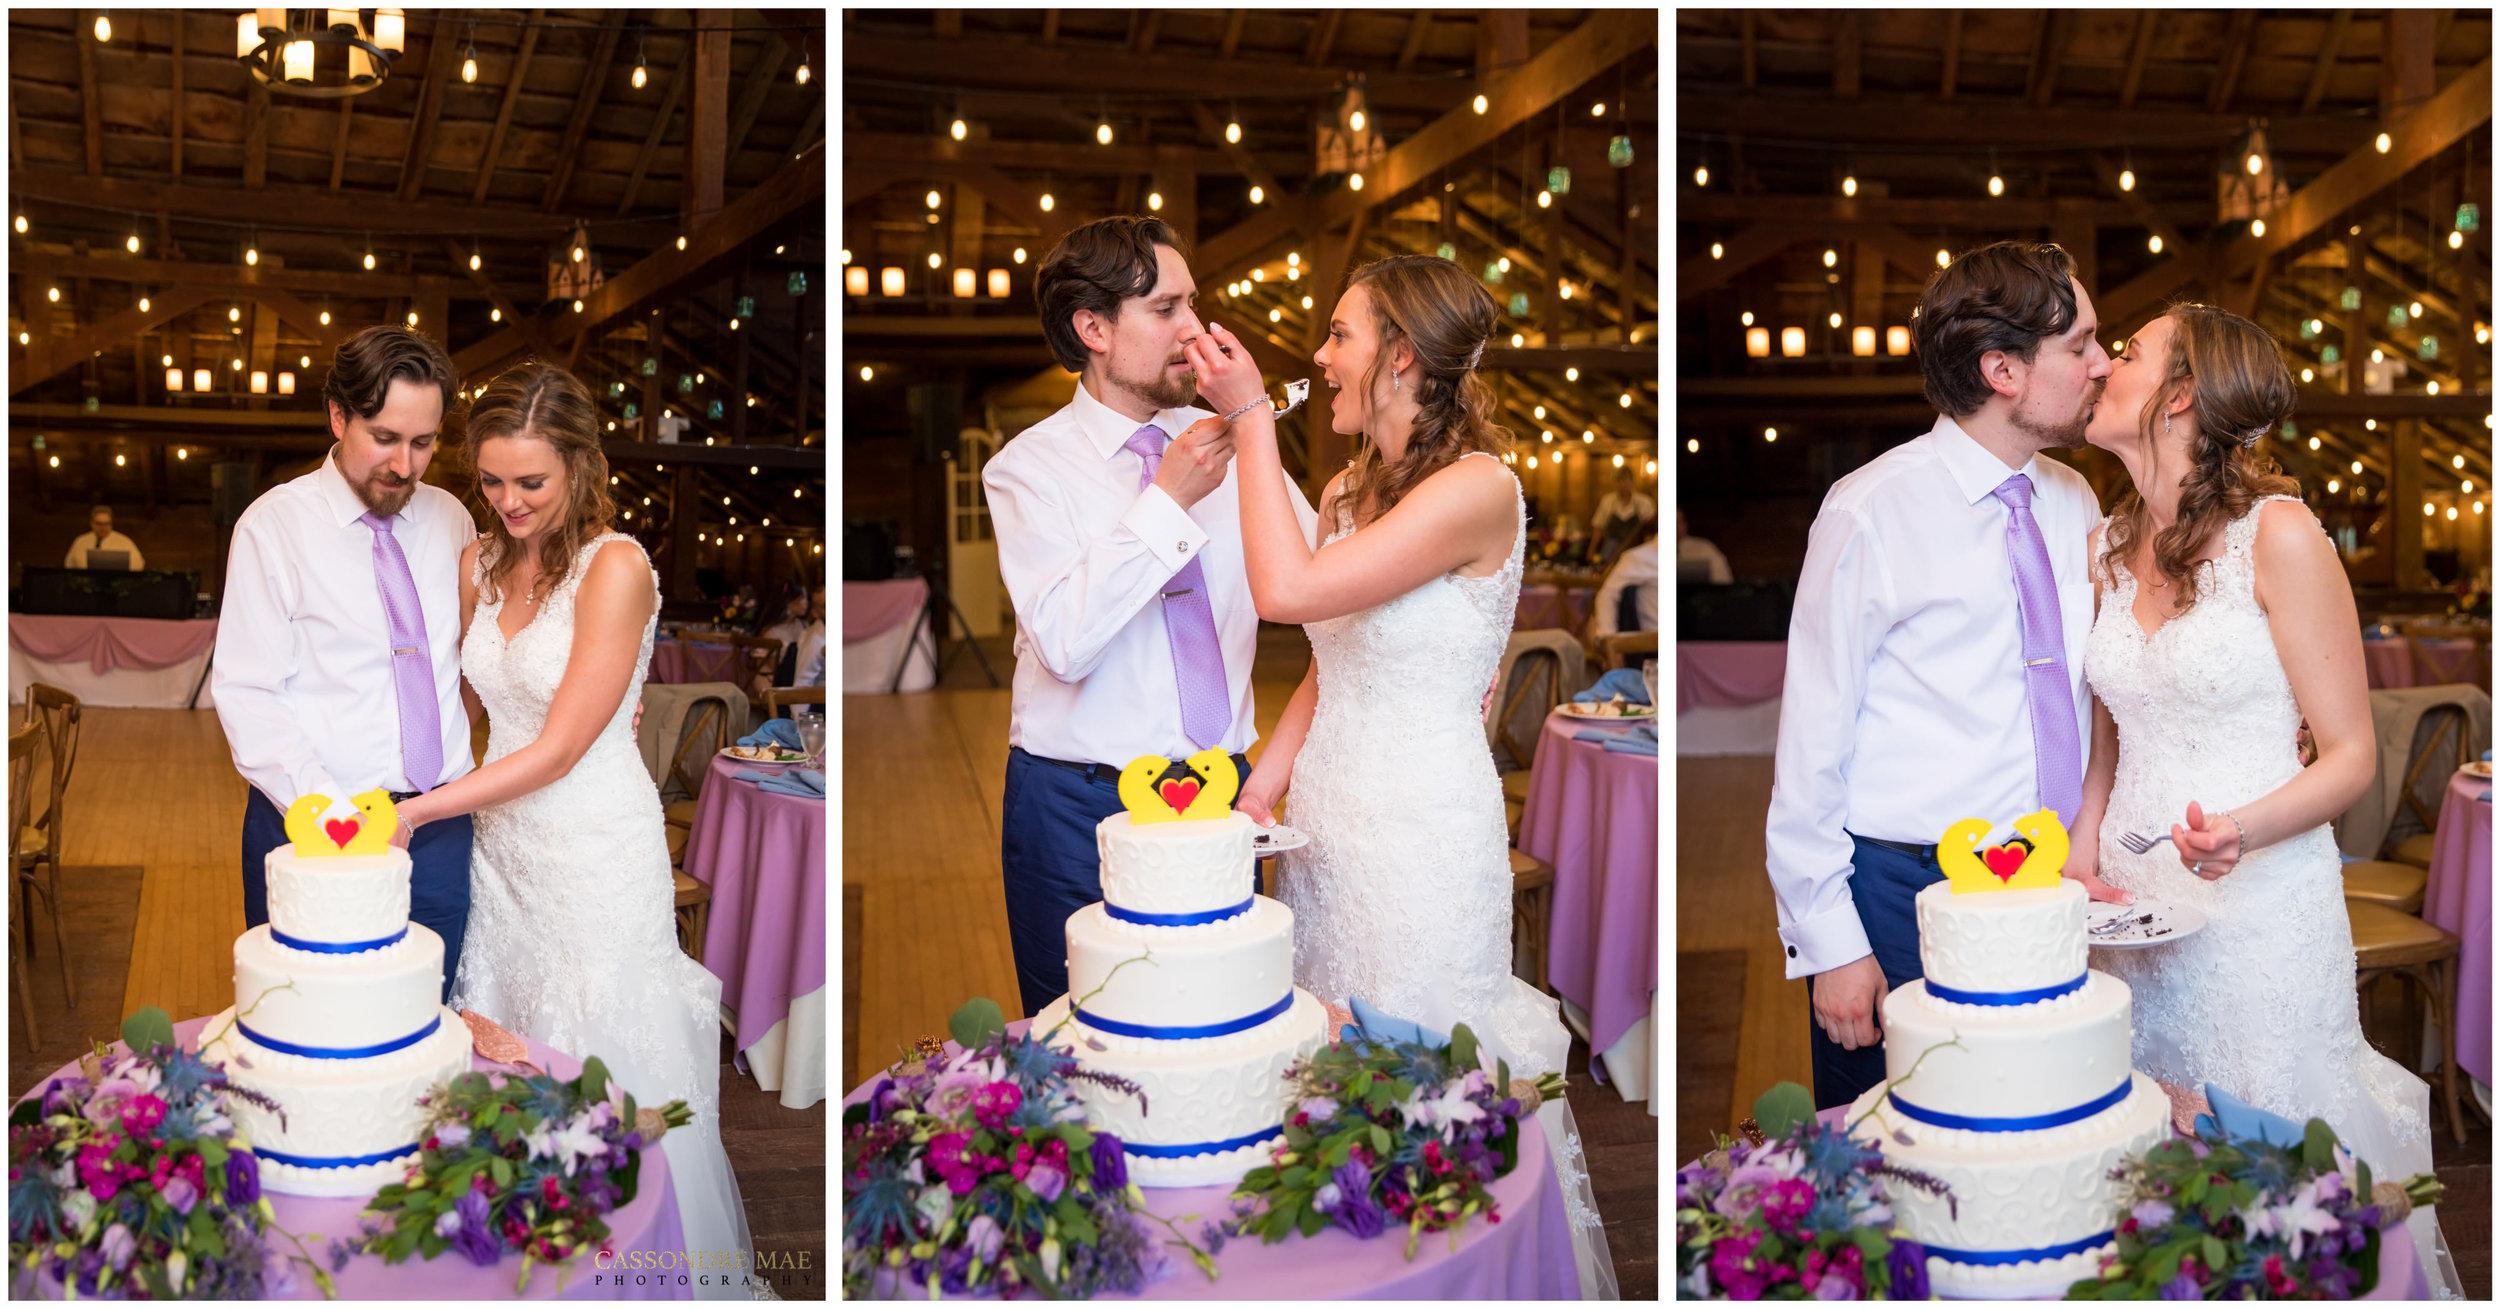 Cassondre Mae Photography hudson valley barn weddings -18.jpg